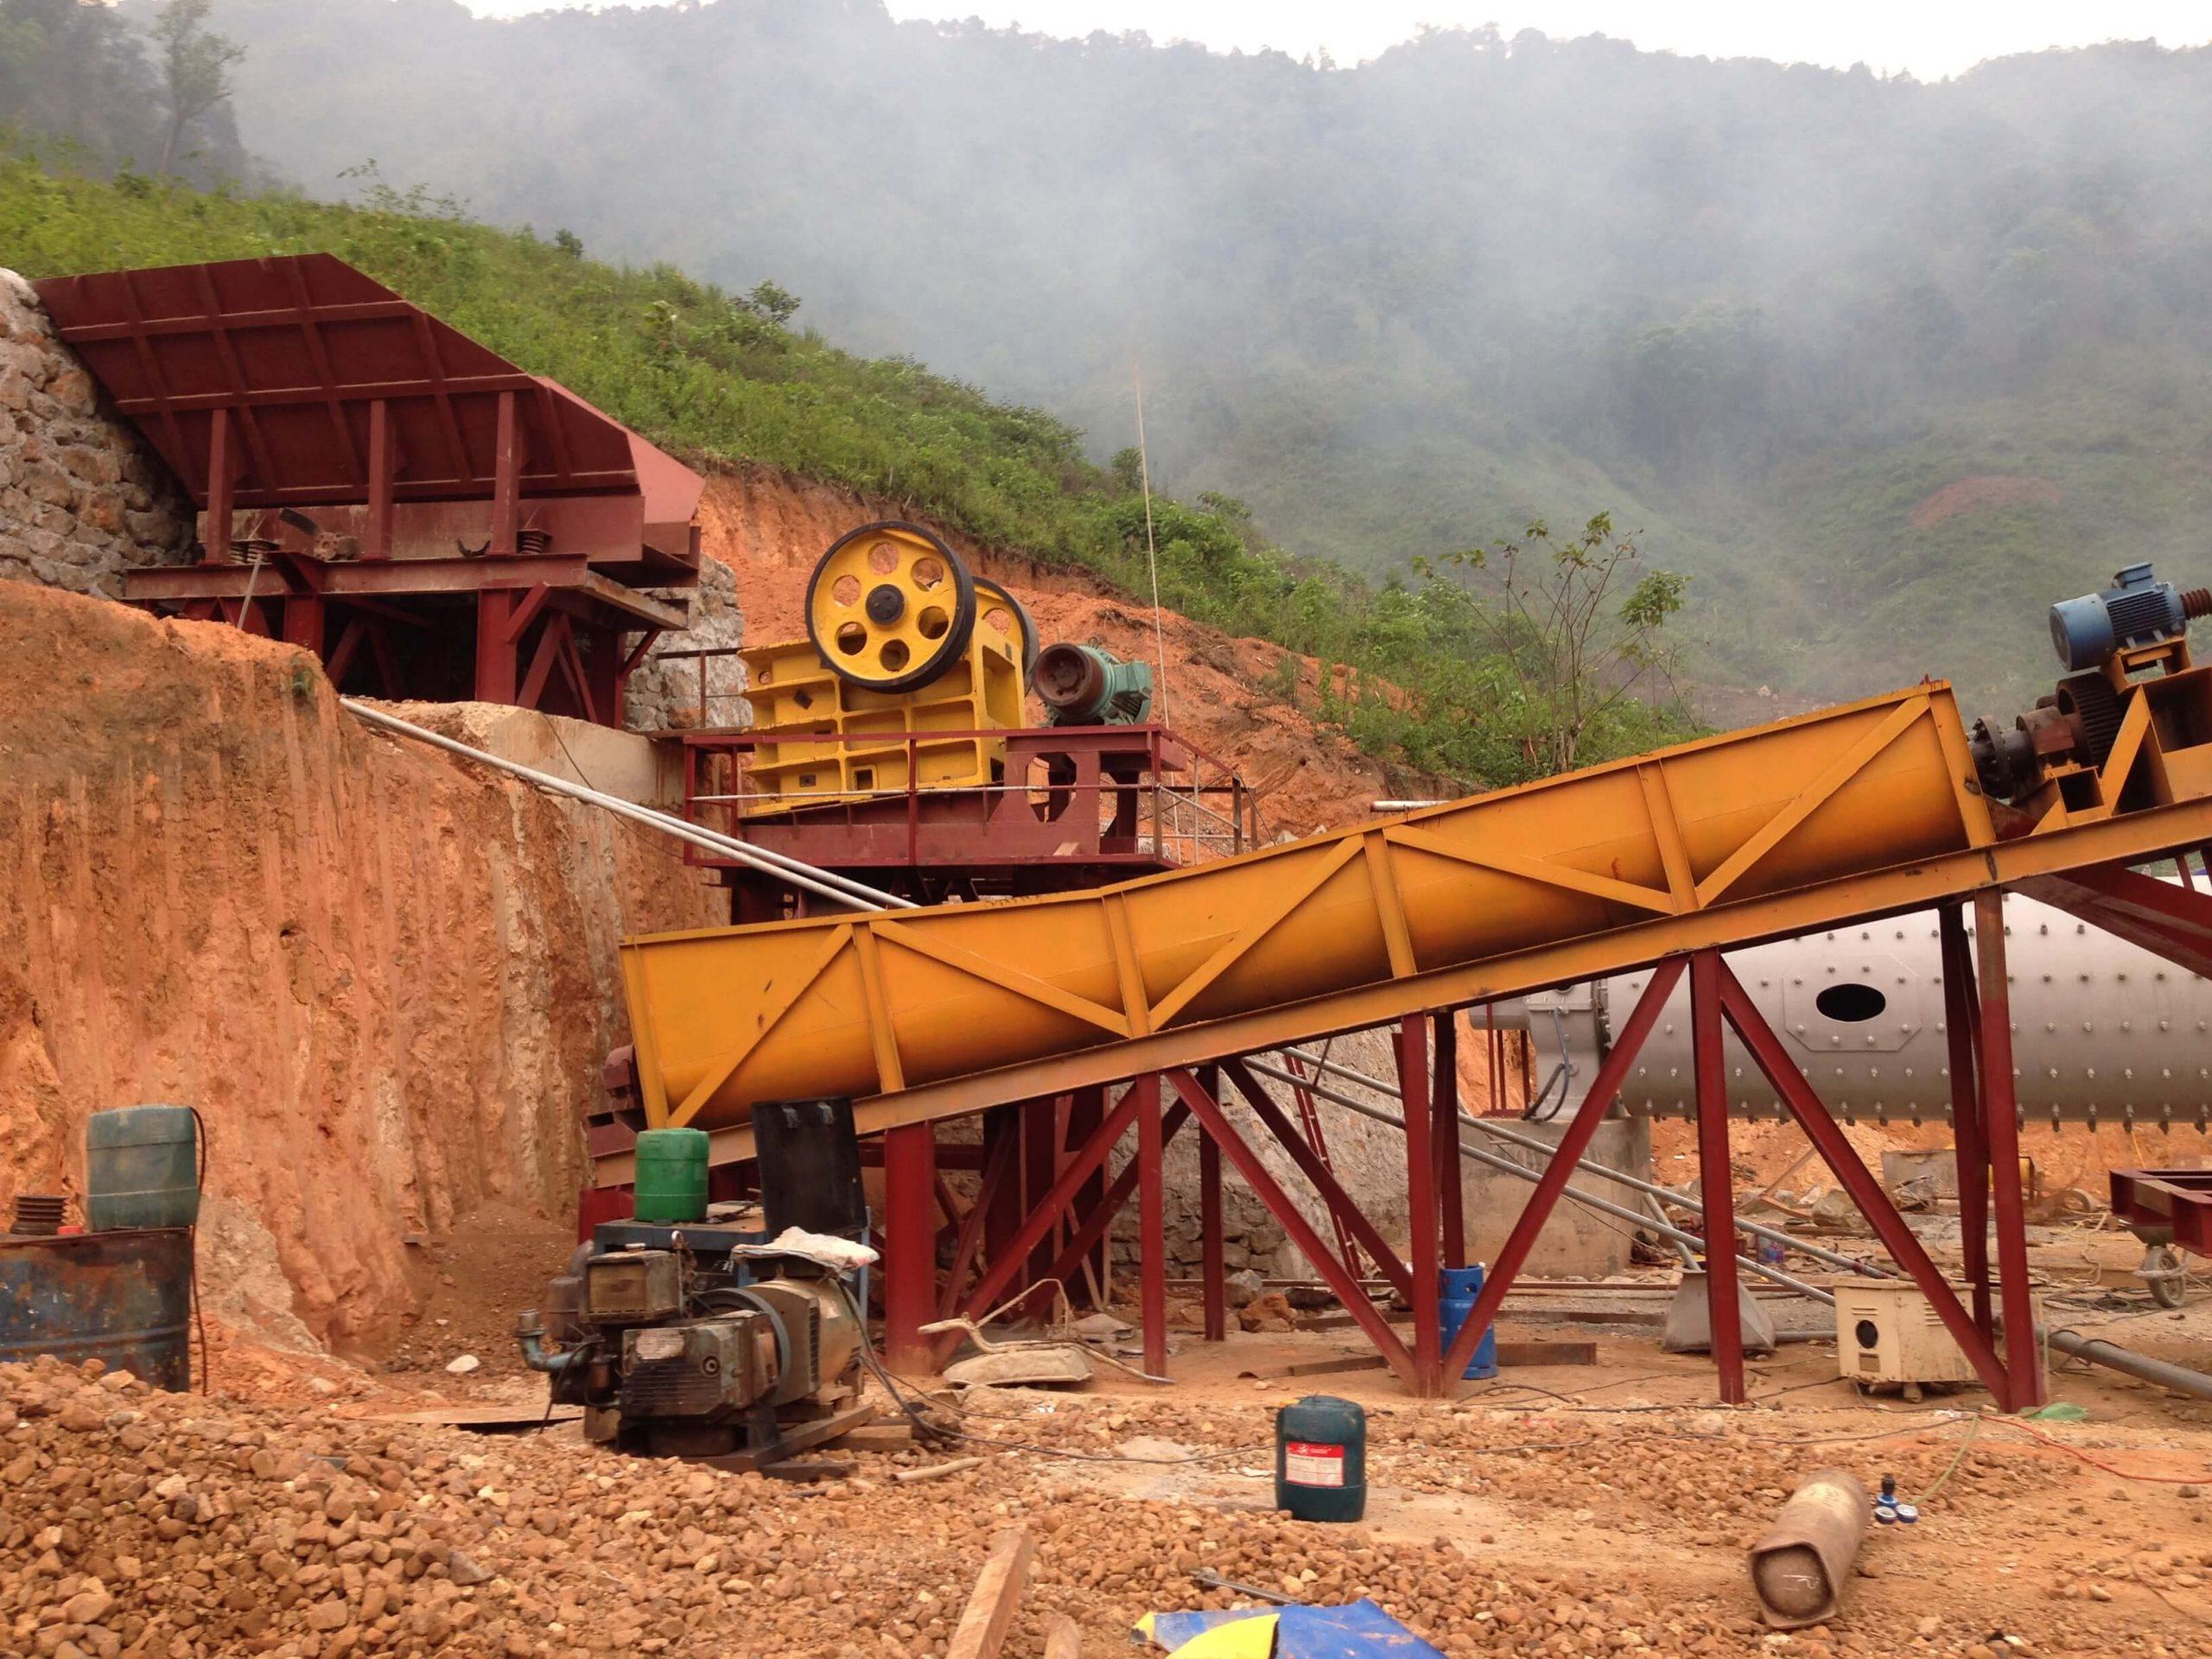 Bong Mieu gold mine (Quang Nam province)